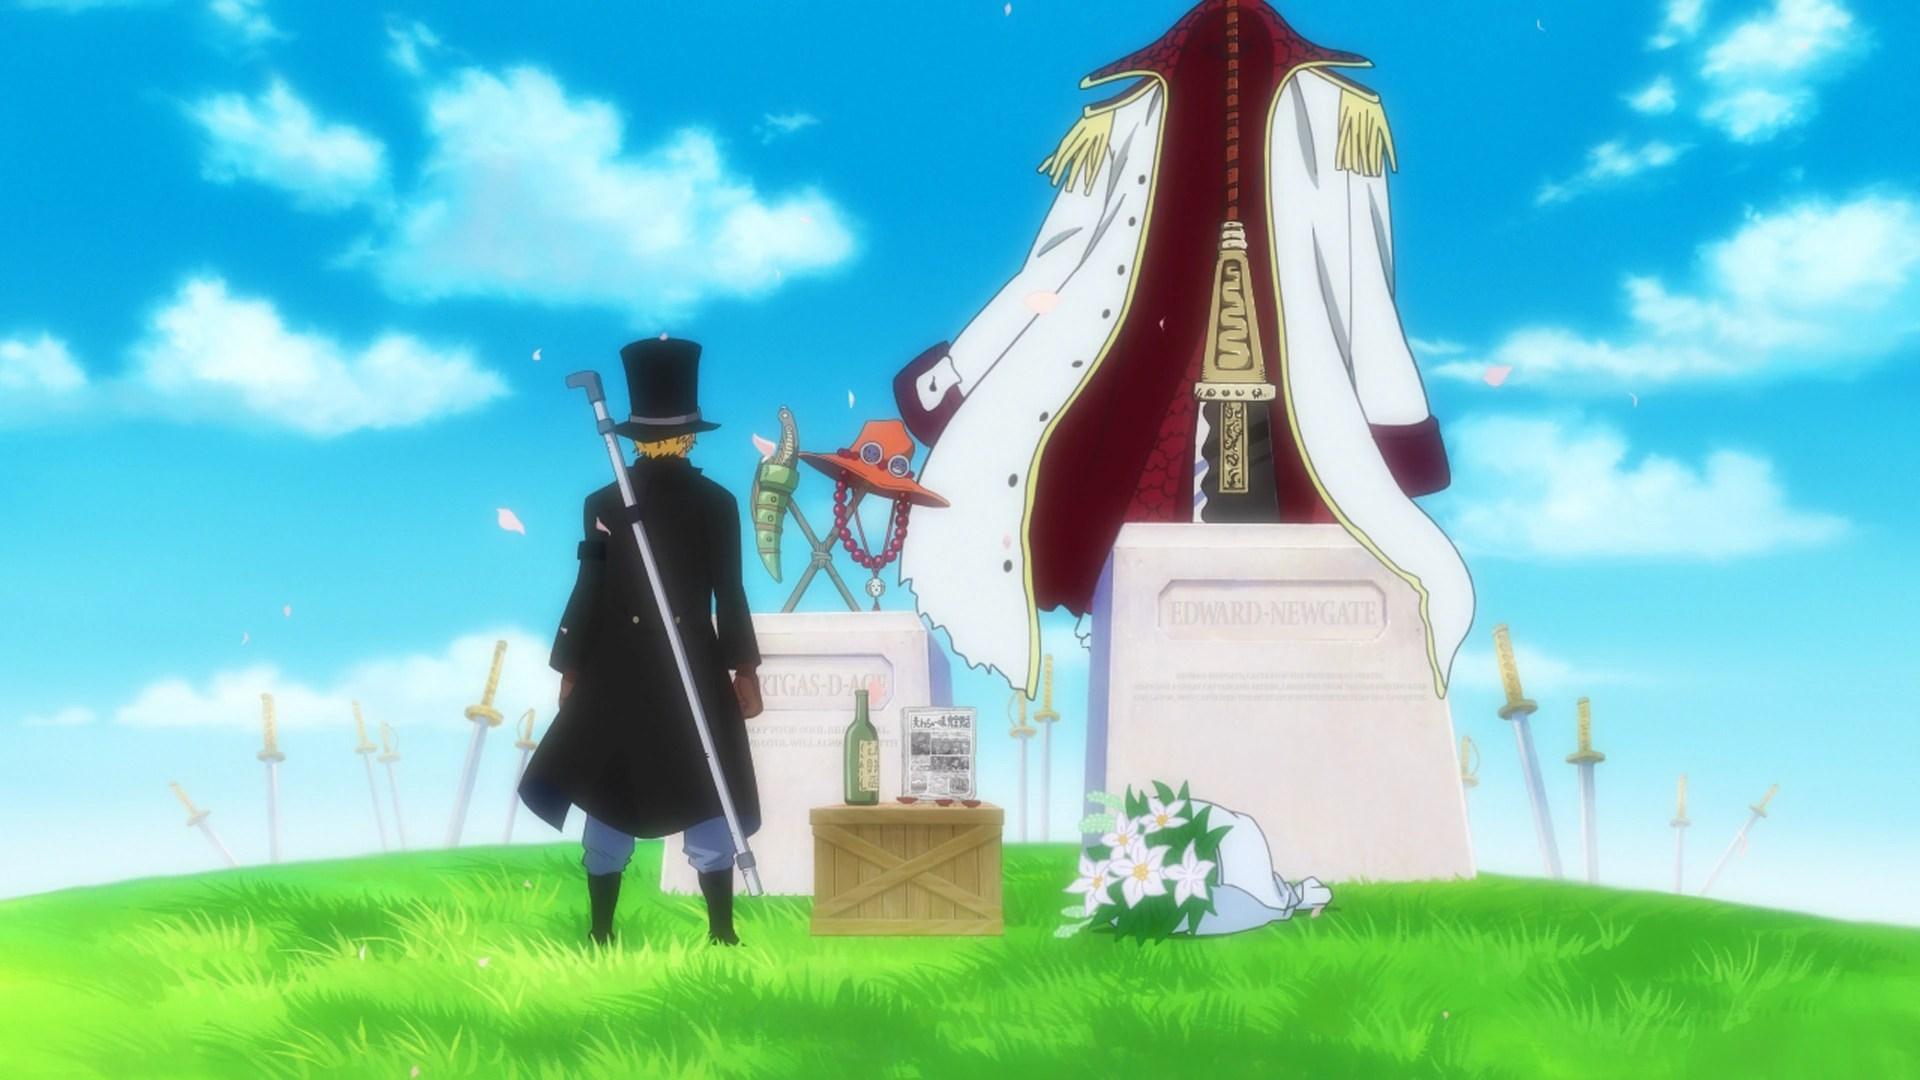 Roronoa zoro timeskip kerchief character one piece wiki, one piece,. 3d2y One Piece Wiki Fandom